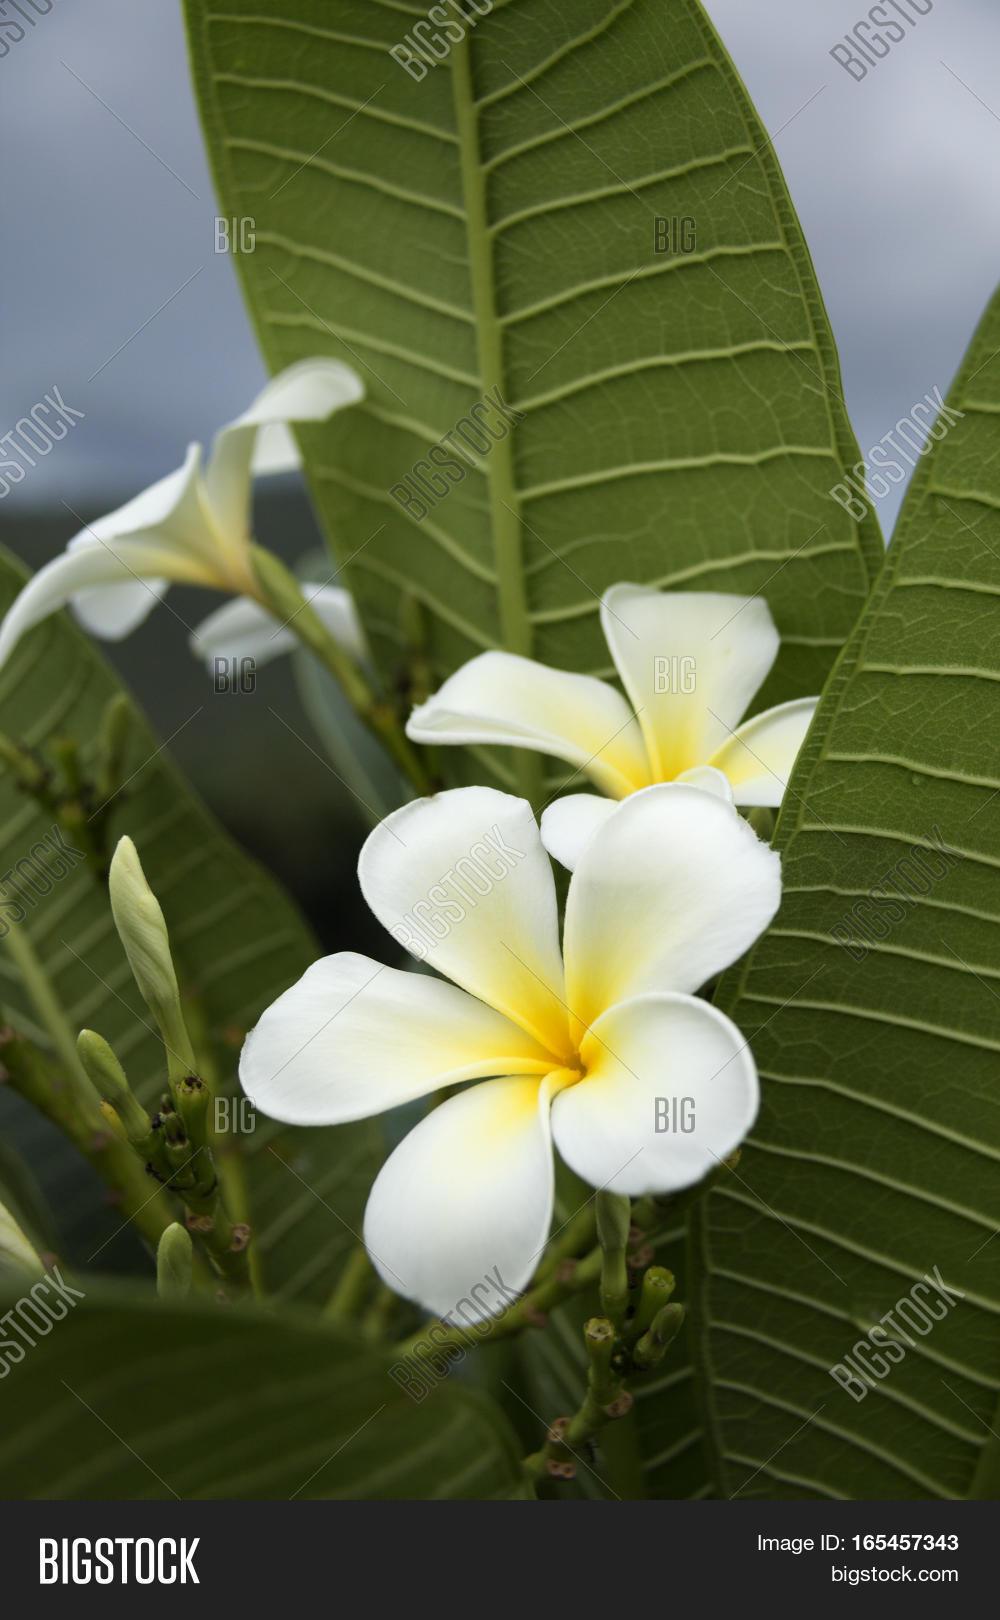 Five Petal White Image Photo Free Trial Bigstock